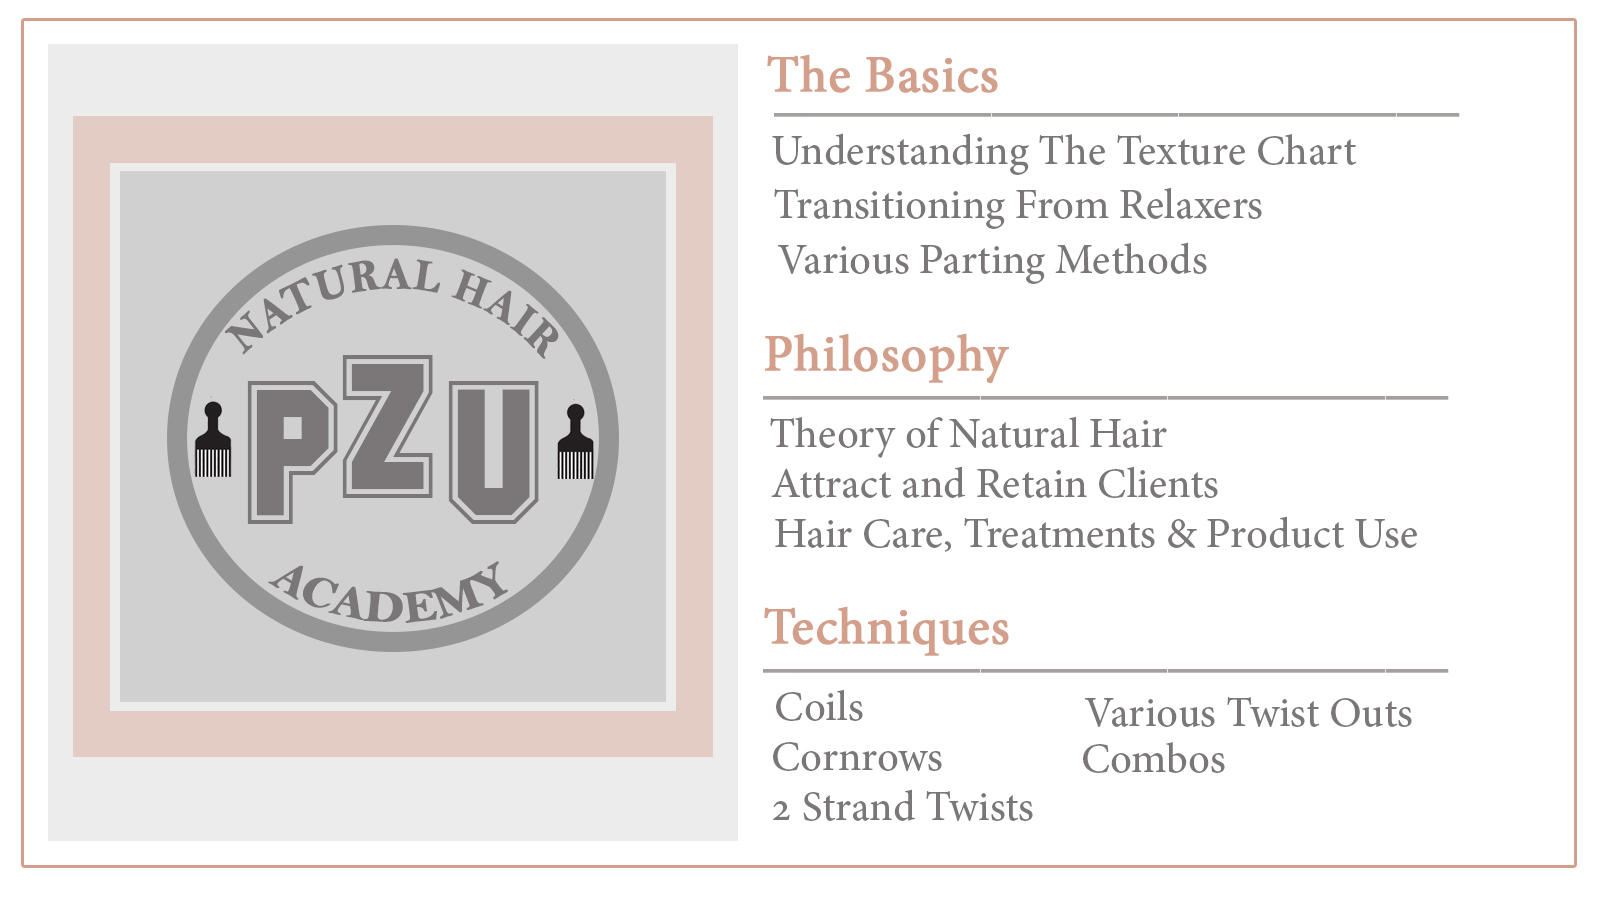 Natural Hair Academy